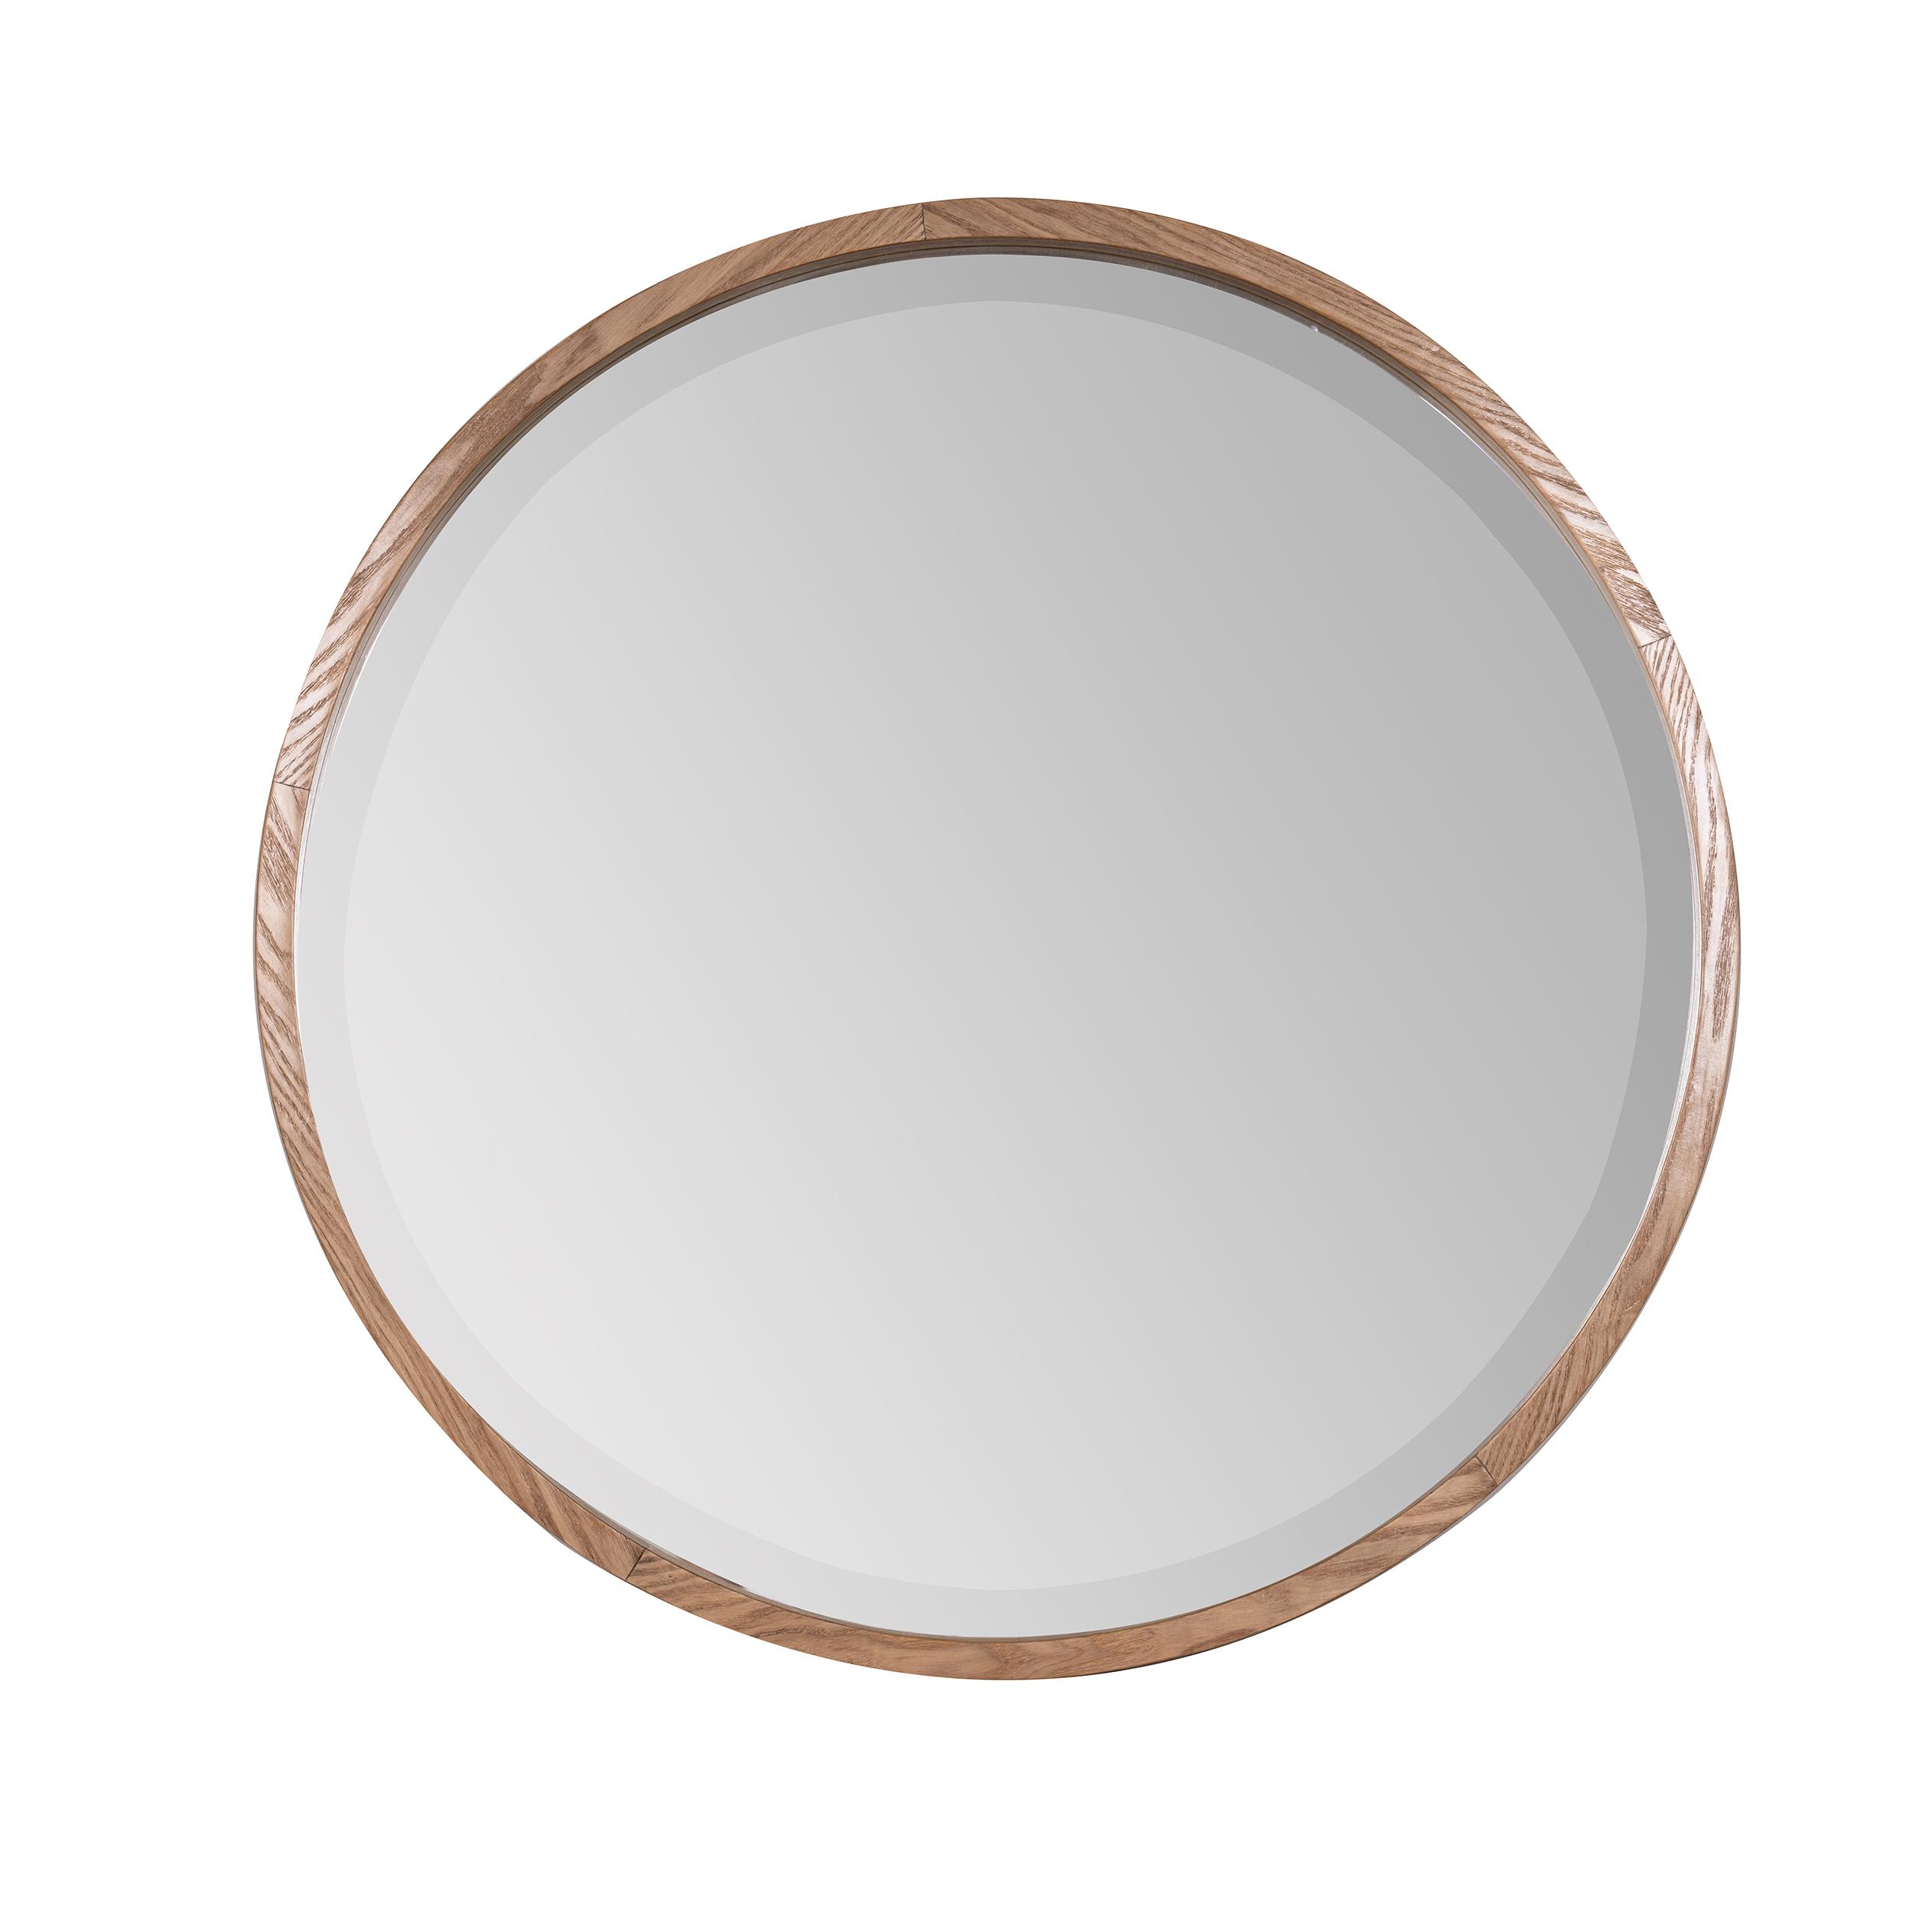 Parson Wall Mirror Regarding Favorite Parsons Wall Mirrors (View 4 of 20)